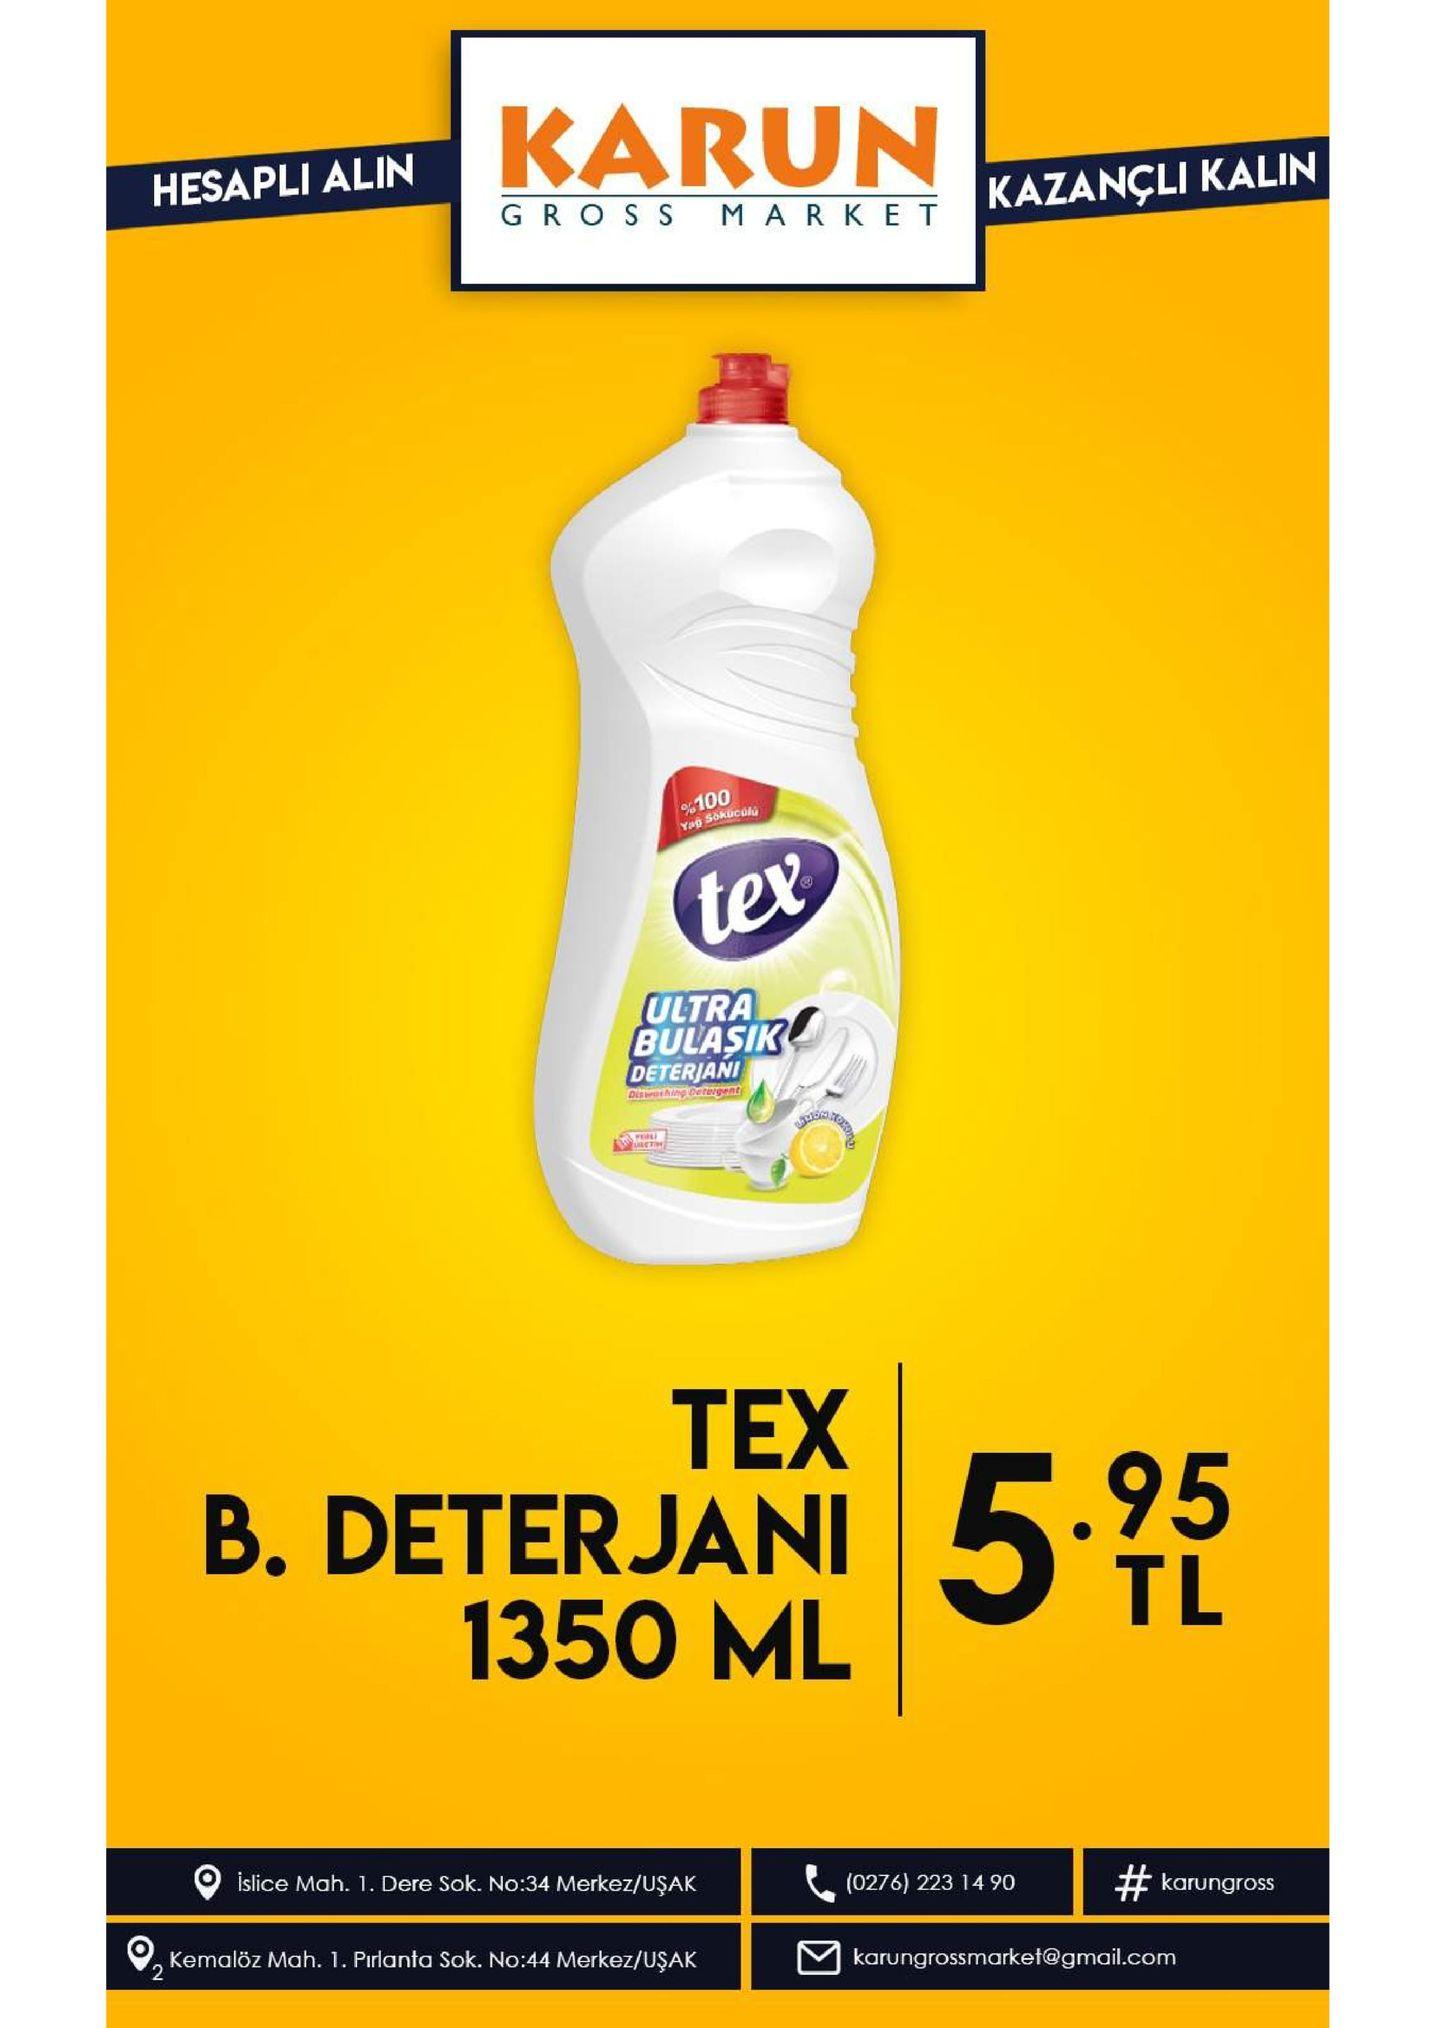 karun hesapli alin kazancli kalin gro s s mark e t 100 yap sokucul tex ultra bulasik deterjani dus ng detergent lretn tex b.deterjani 1350 ml .95 tl islice mah. 1. dere sok. no:34 merkez/uşak (0276) 223 14 90 # karungross kemalöz mah. 1. pirlanta sok. no:44 merkez/uşak 2 karungrossmarket@gmail.com